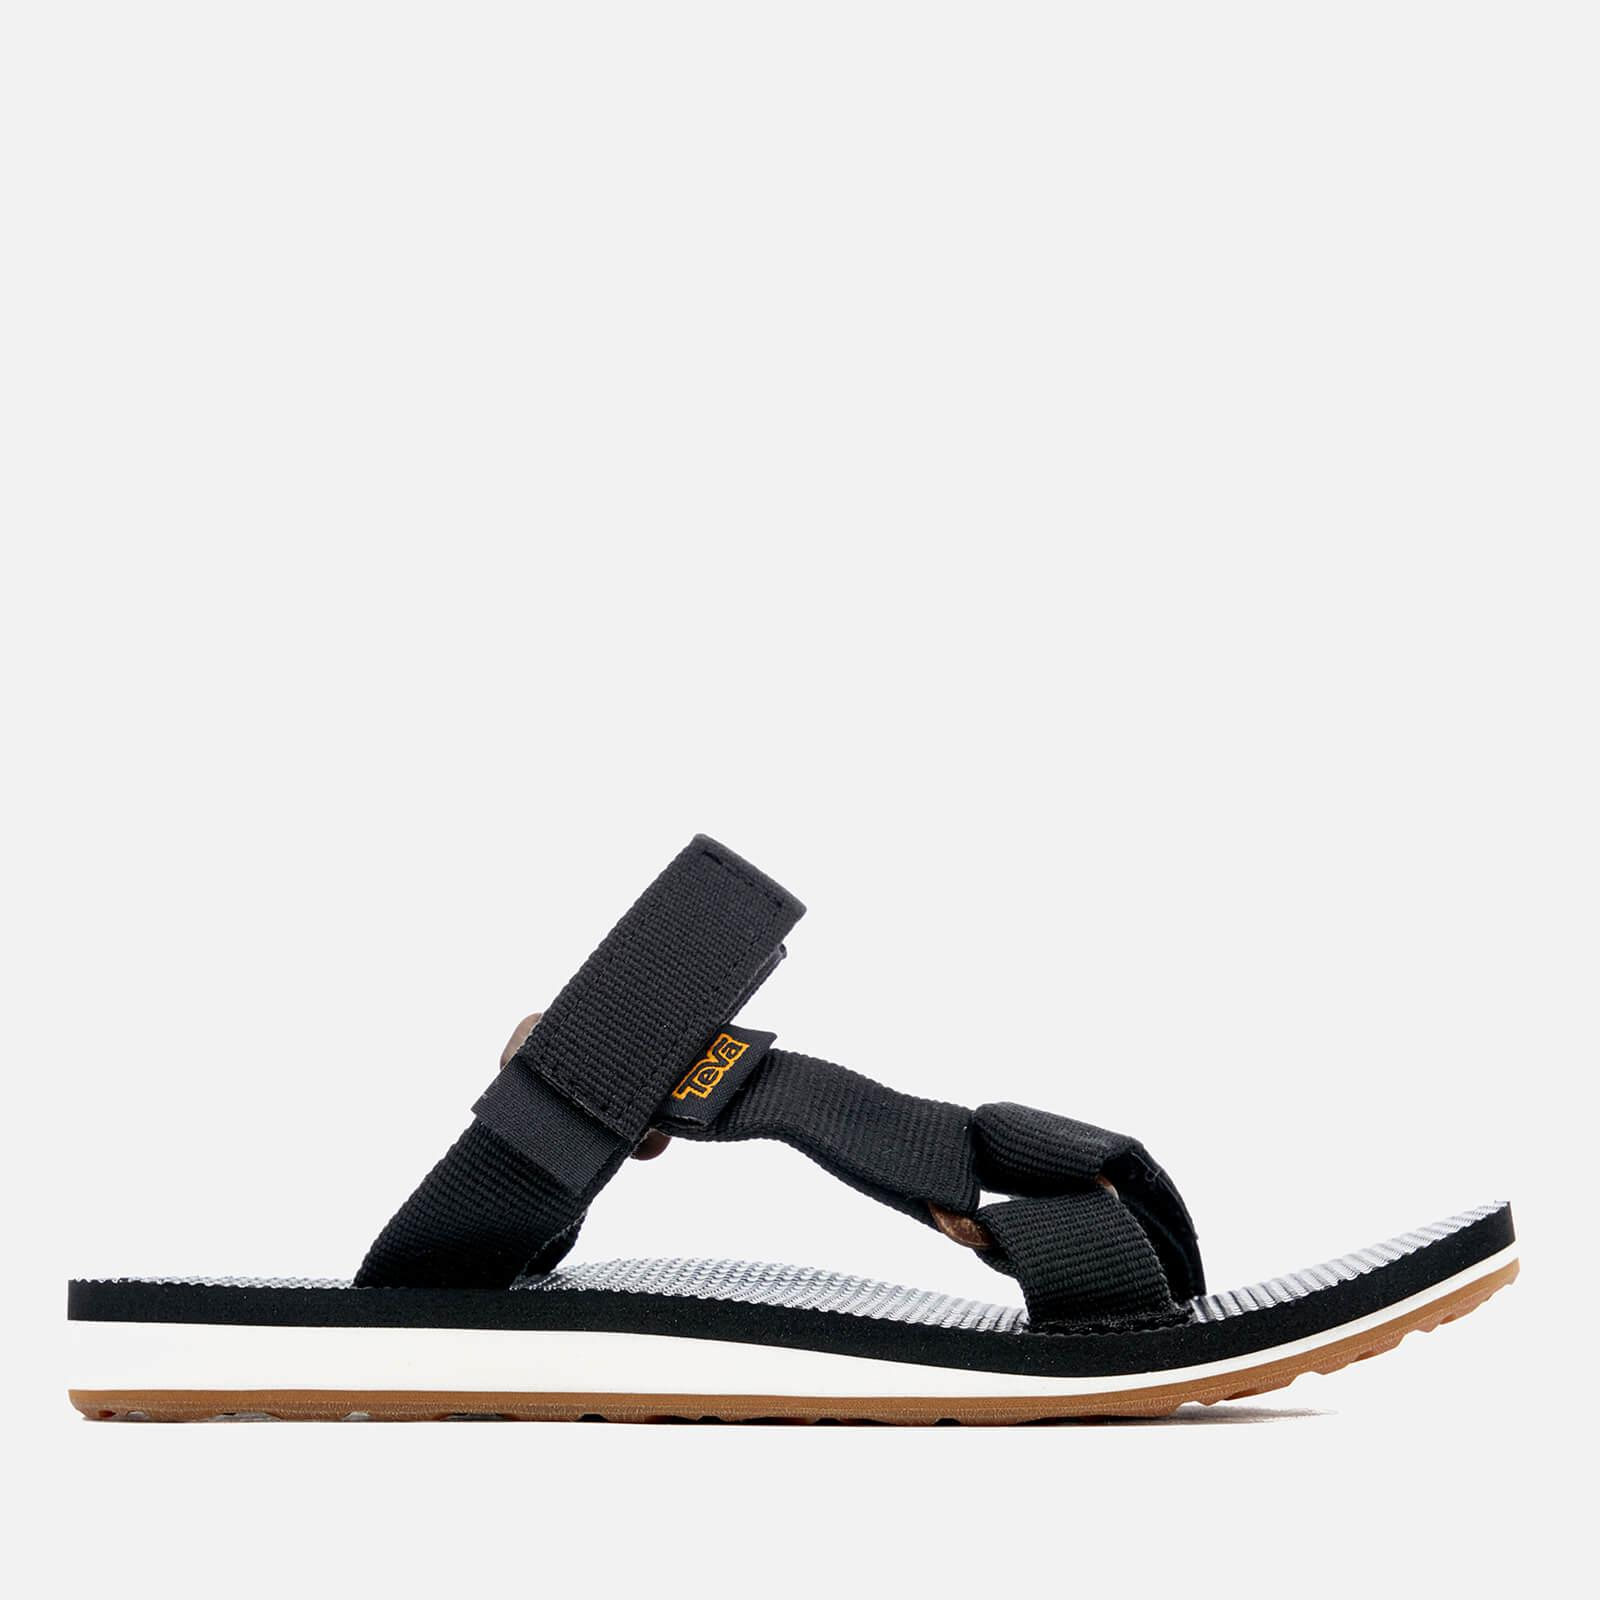 3a4c3214aa0 Lyst - Teva Universal Slide Sandals in Black